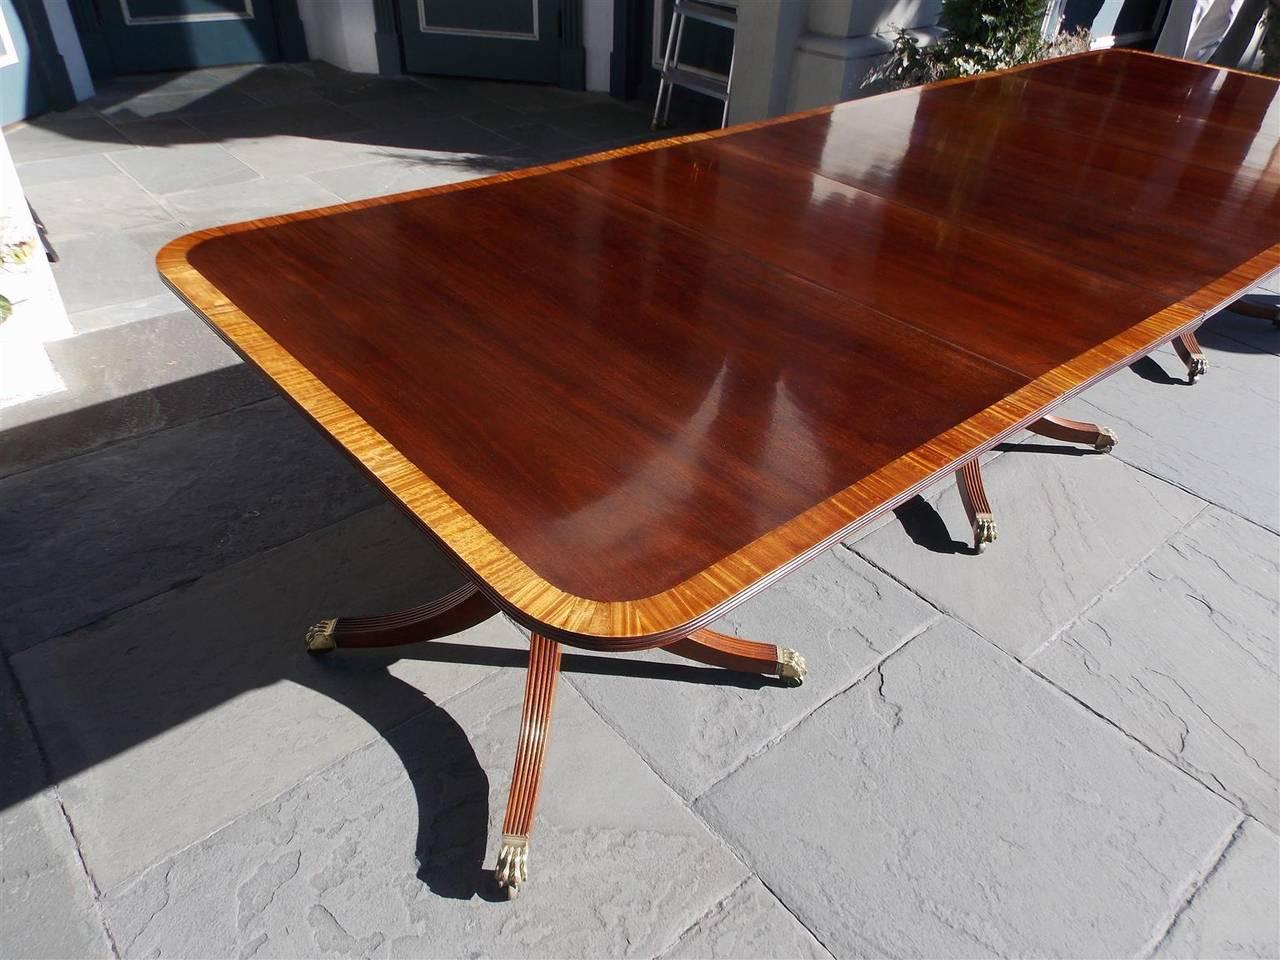 George III English Mahogany Satinwood Inlaid Triple Pedestal Dining Room  Table, Circa 1820 For Sale